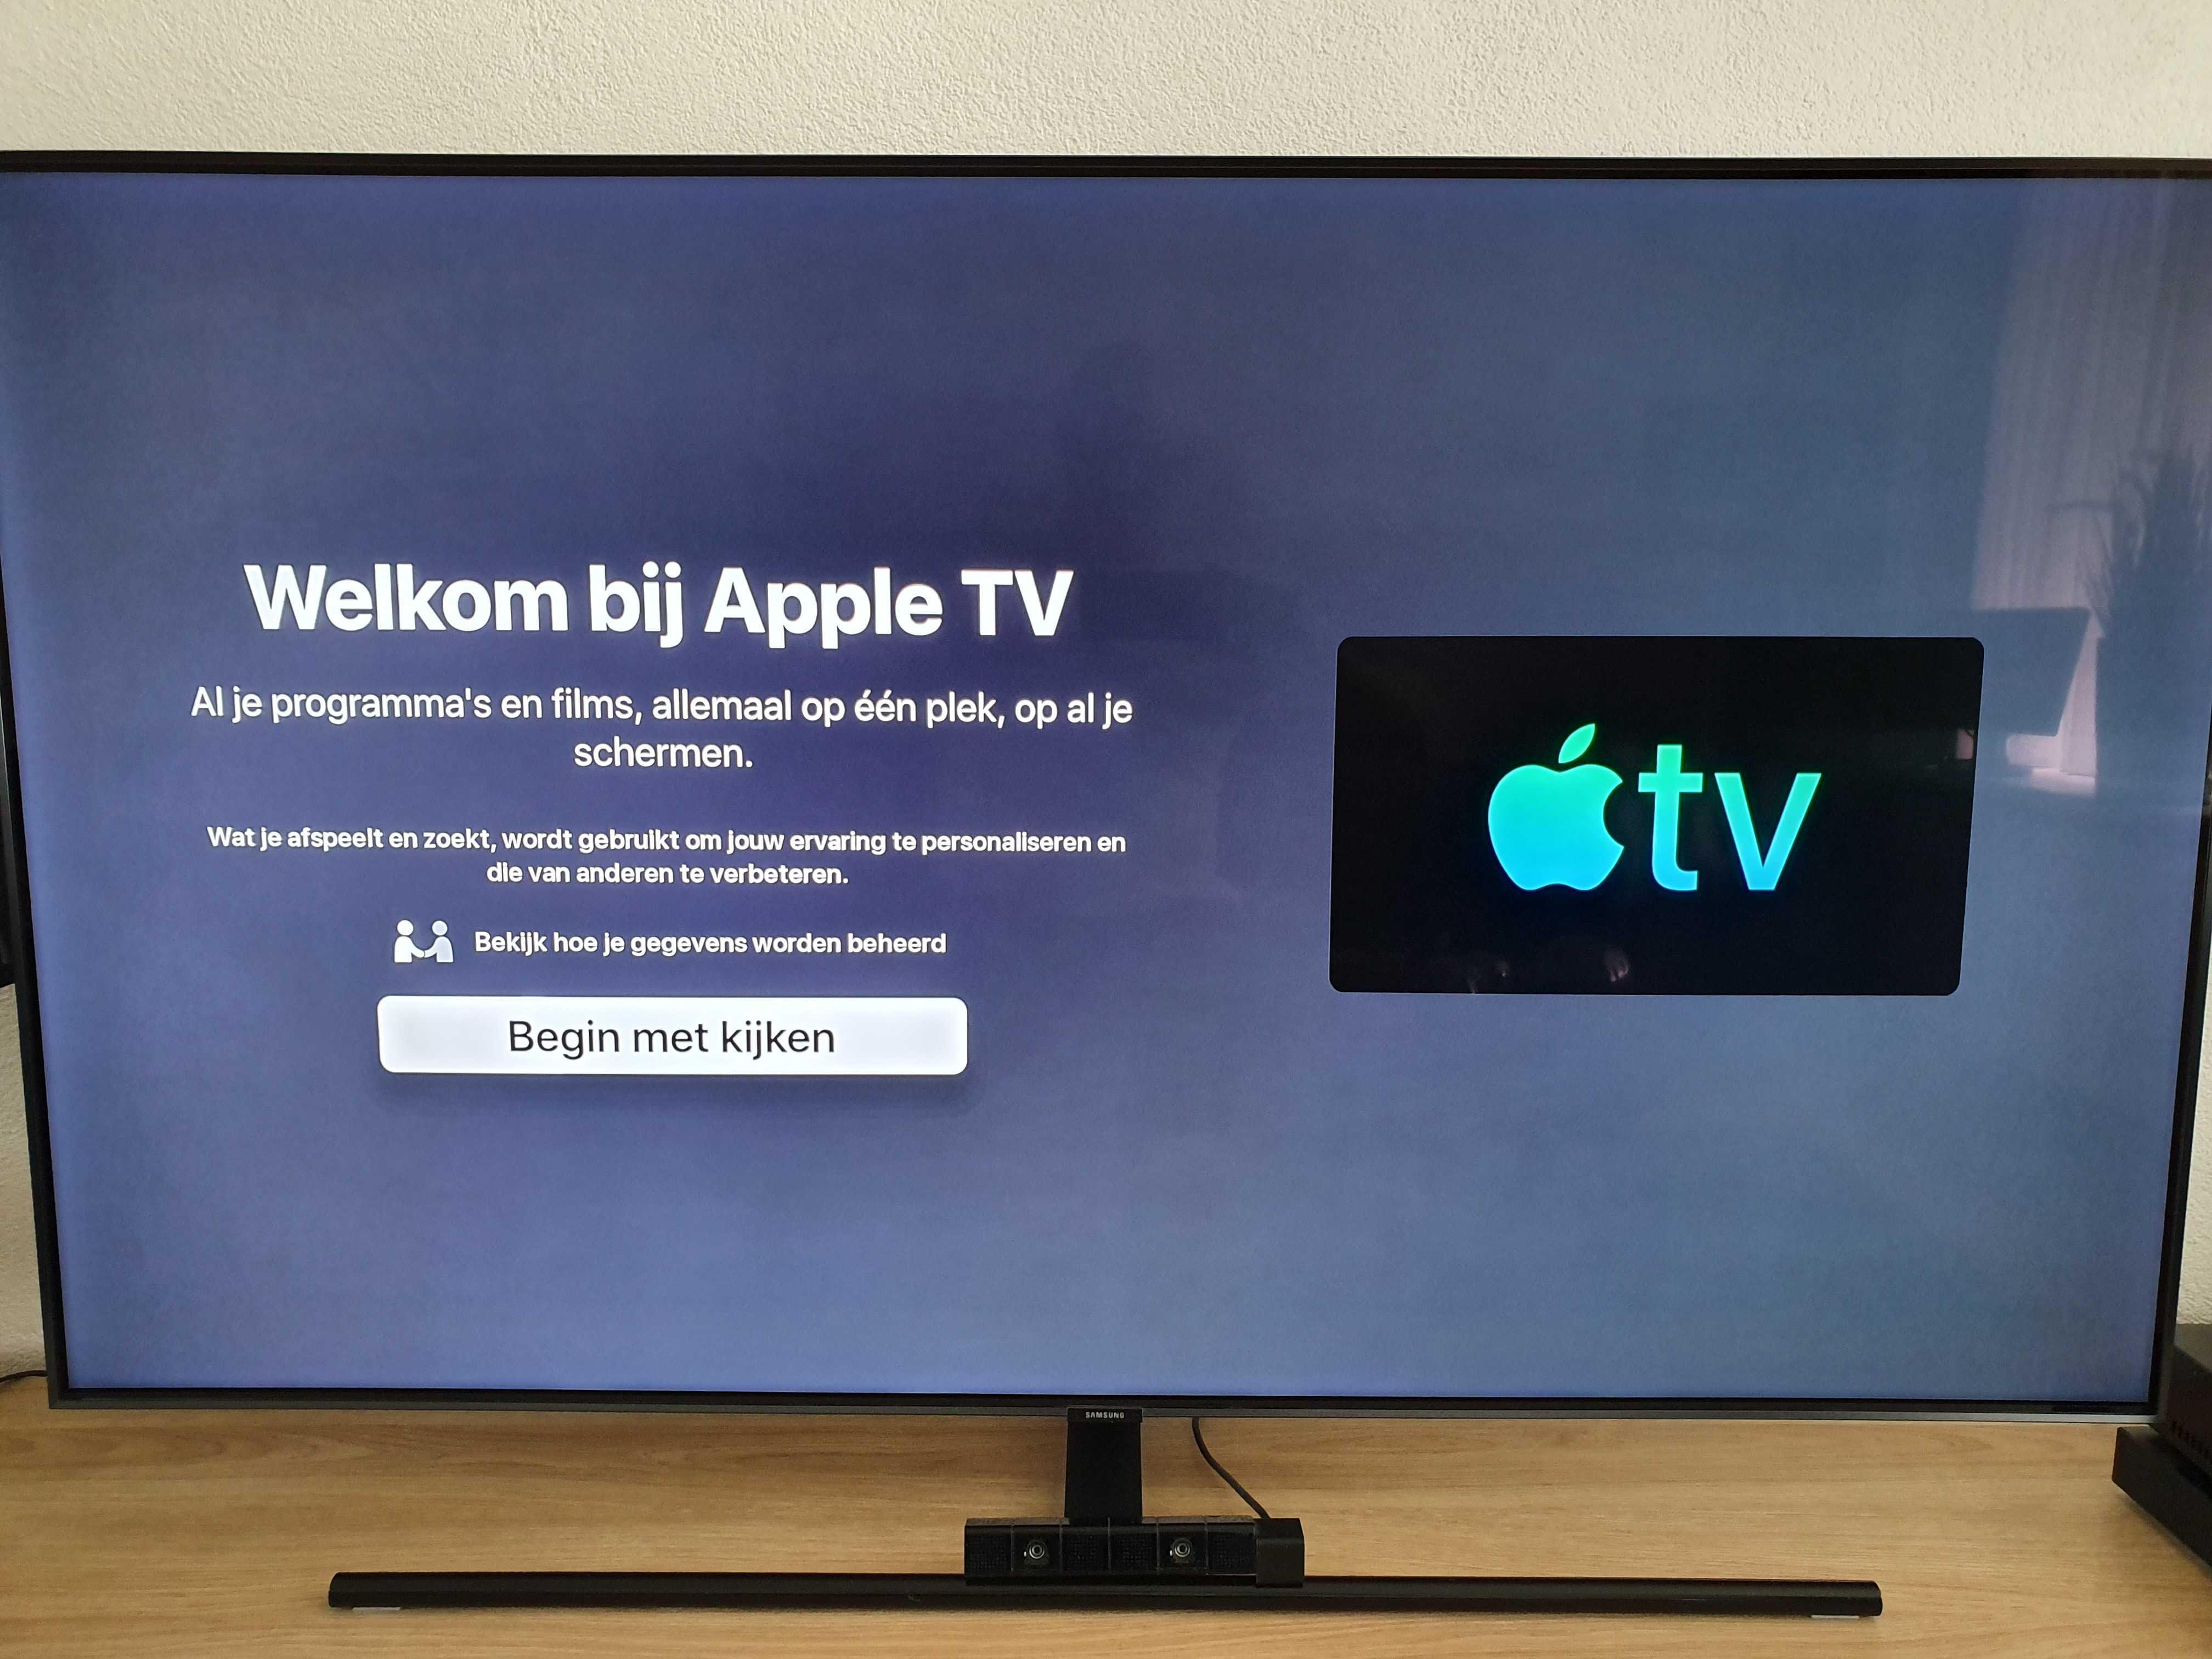 New Apple TV app rolling out for Samsung Smart TVs - SamMobile